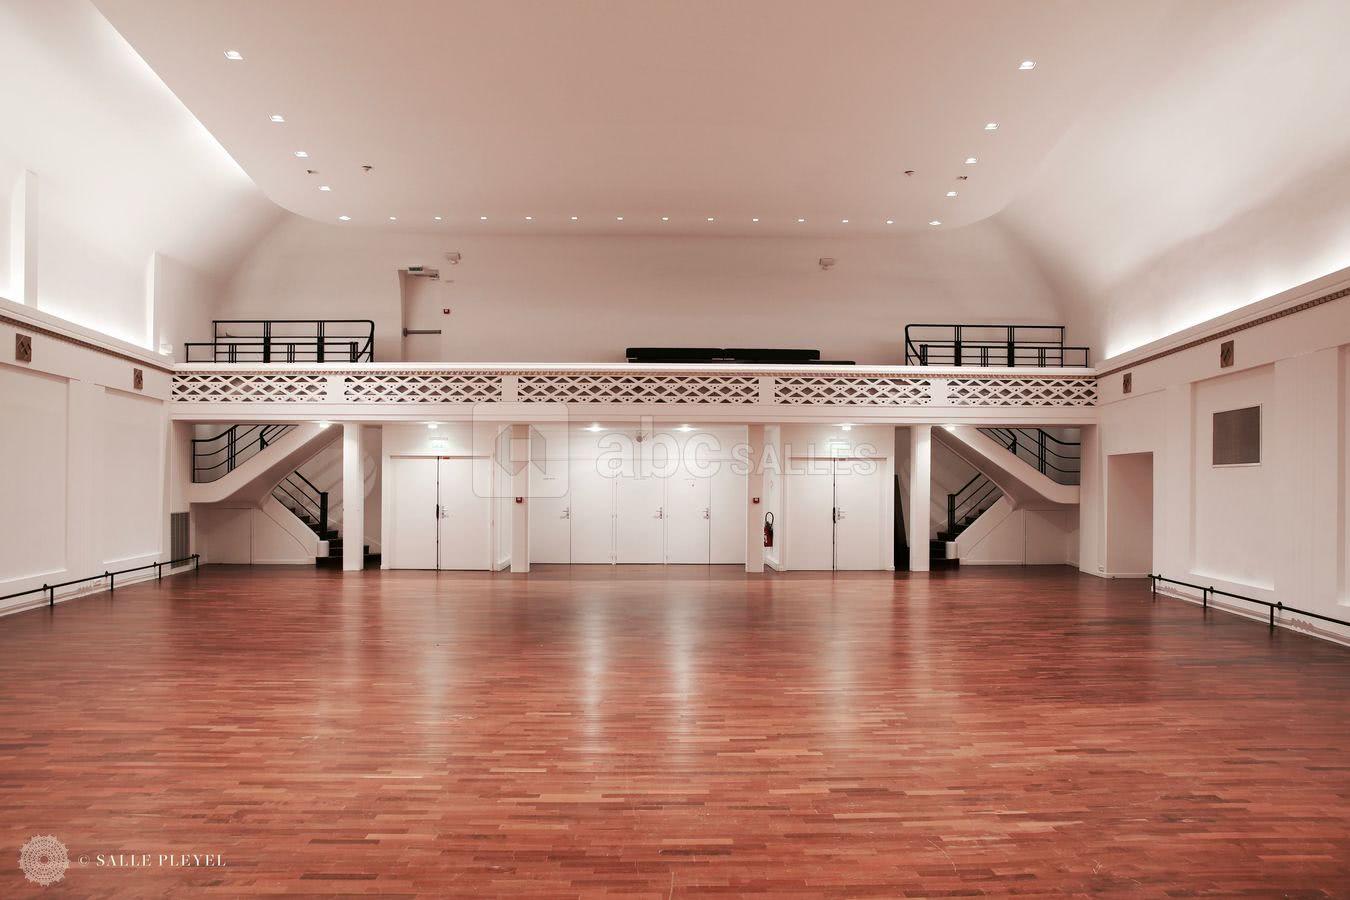 Salle Pleyel Abc Salles